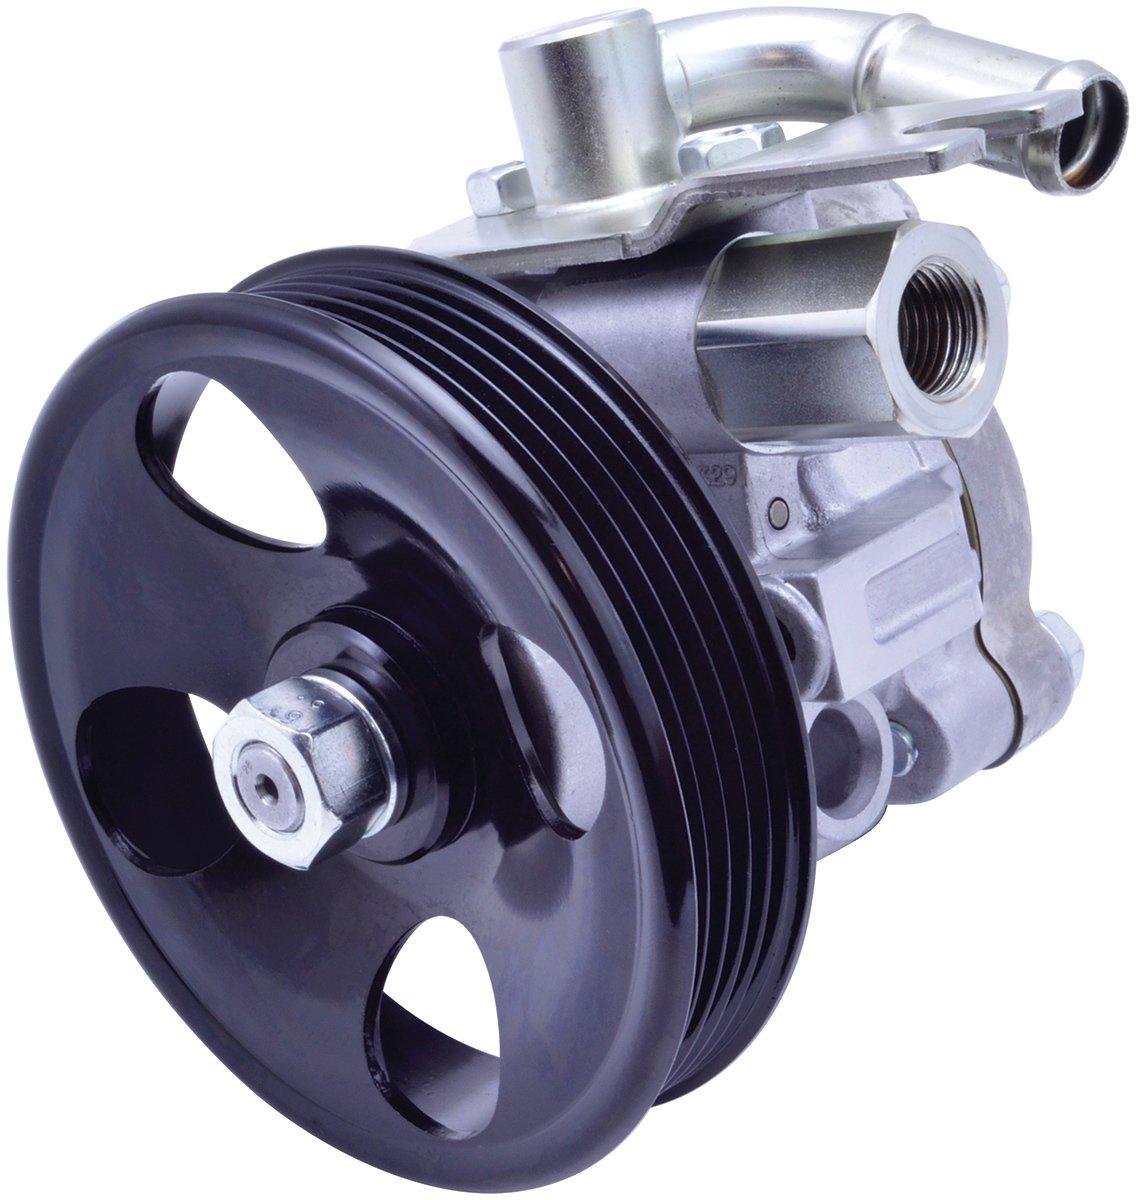 Cardoner Nissan Frontier 2005 Power Steering Pump